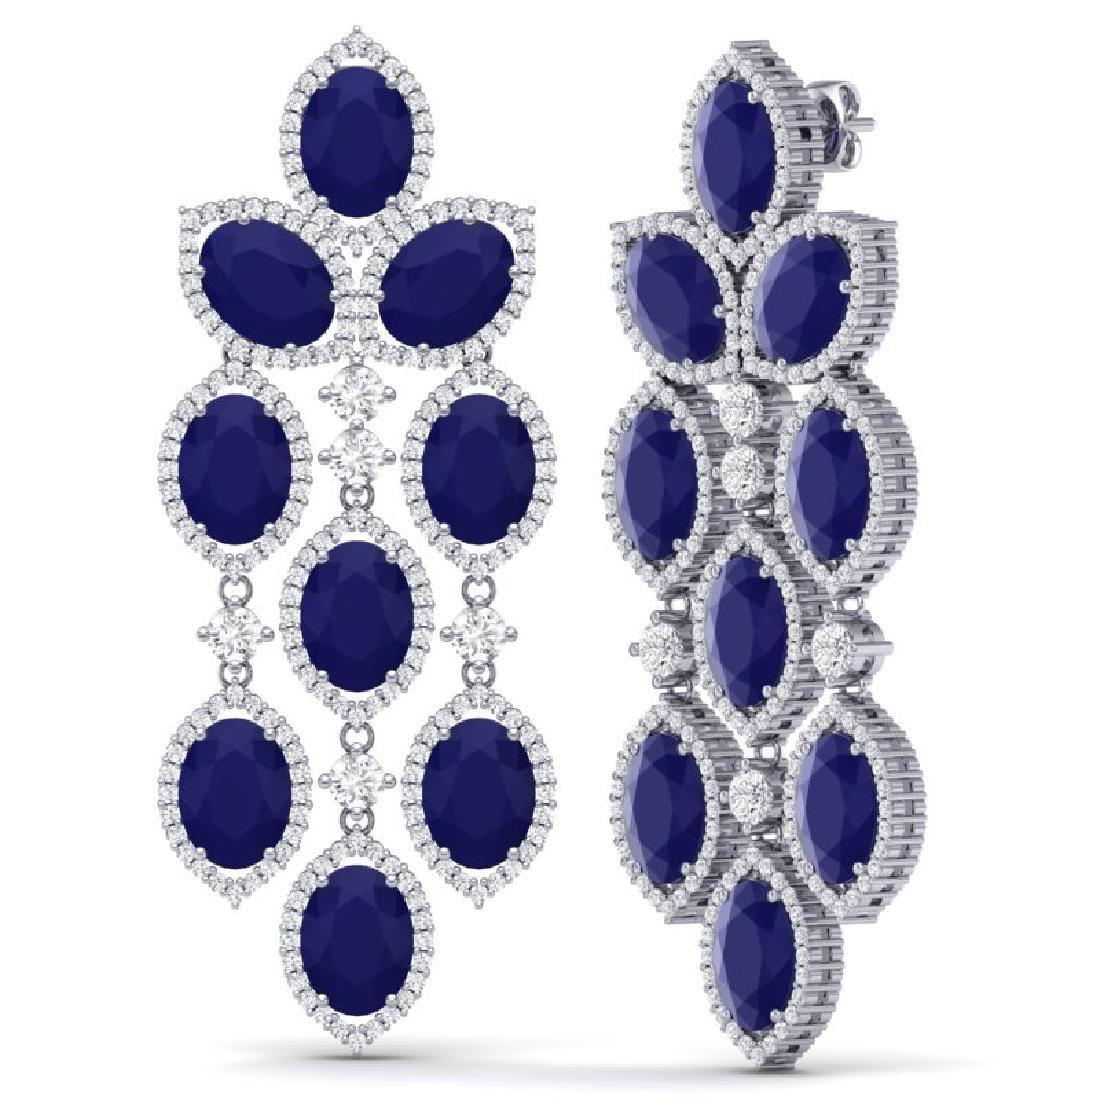 26.15 CTW Royalty Sapphire & VS Diamond Earrings 18K - 3